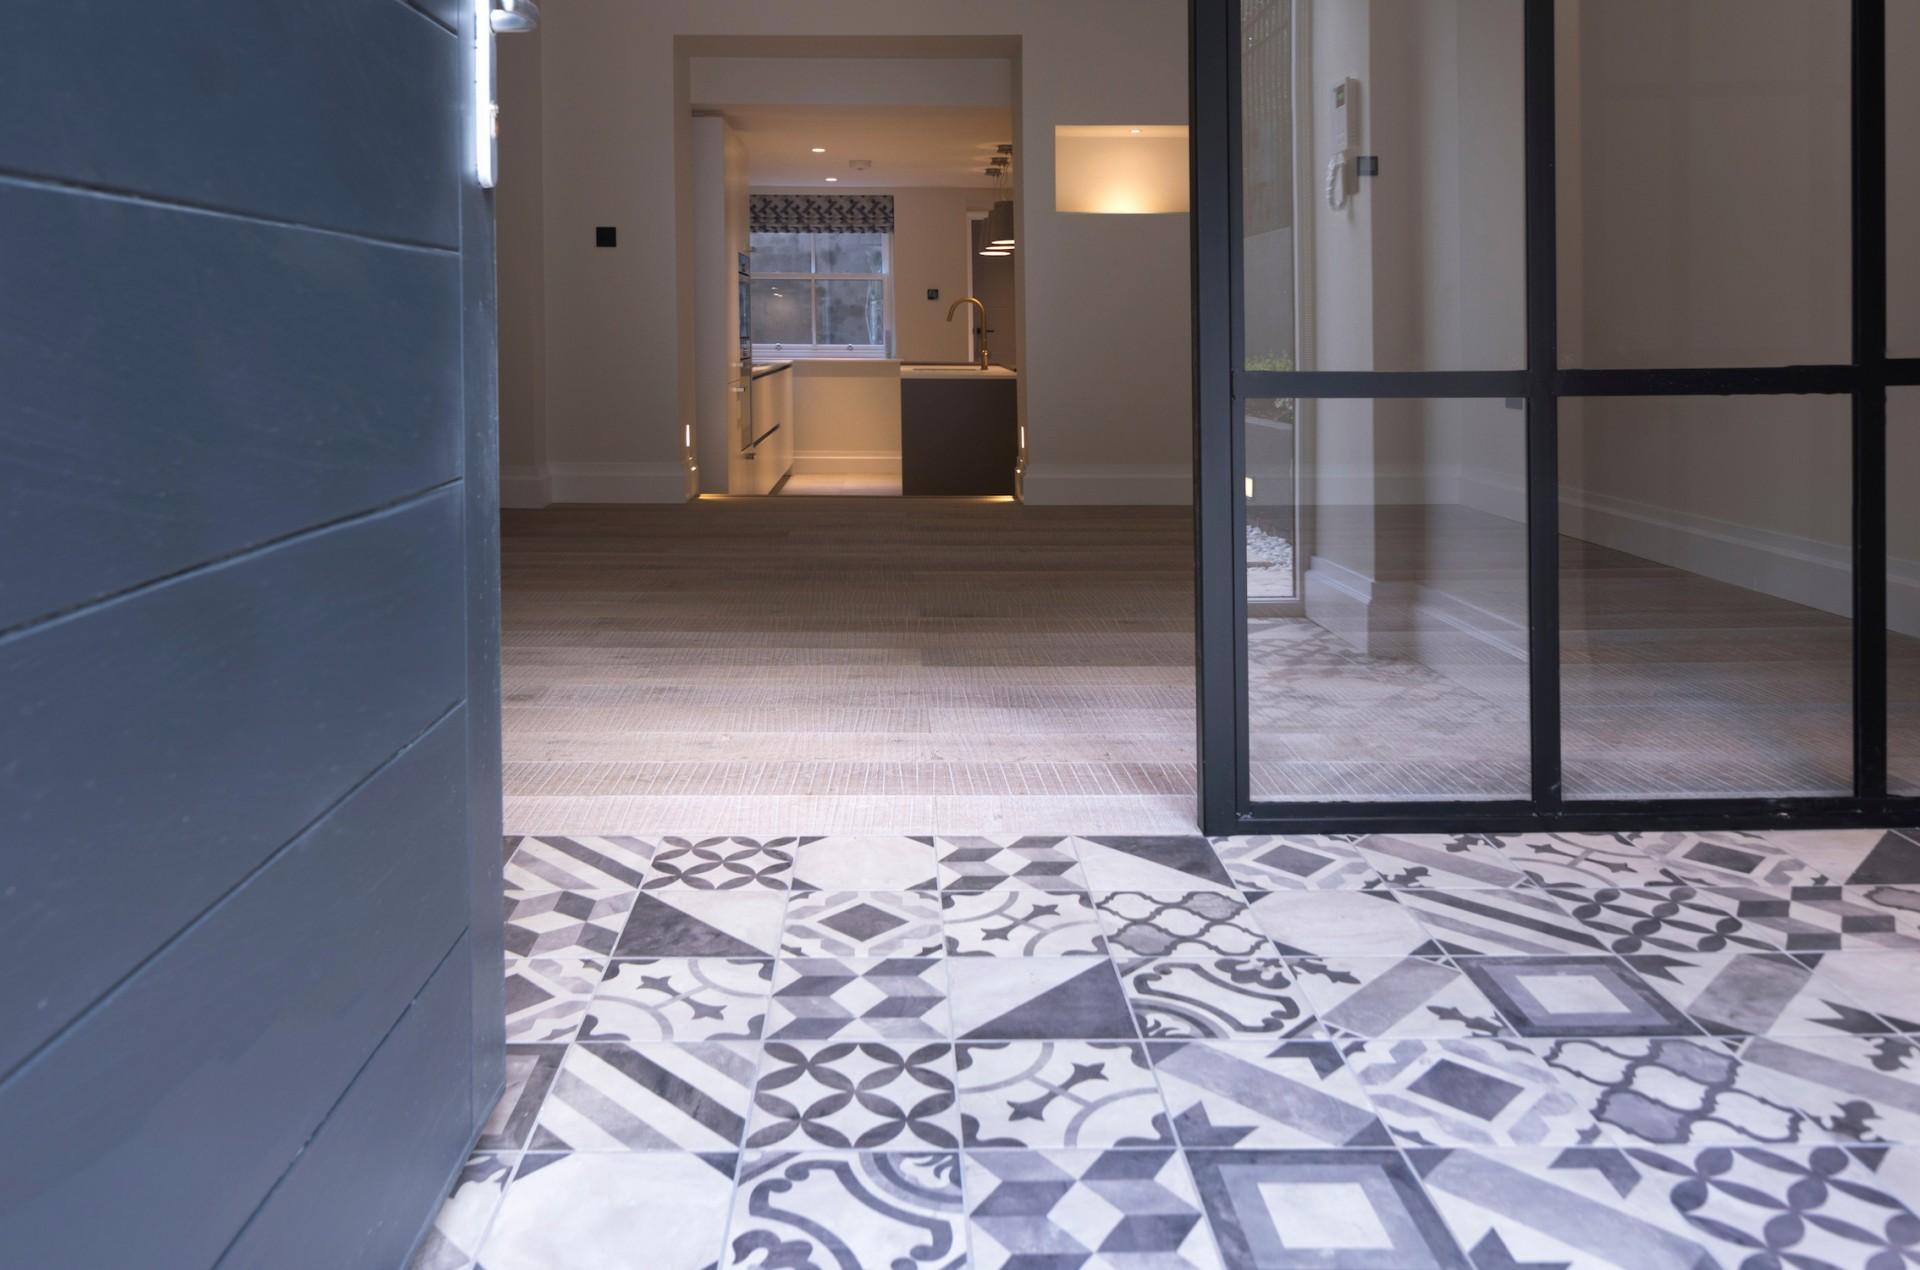 Cheshire Apartment Renovation - Casa Ceramica Manchester